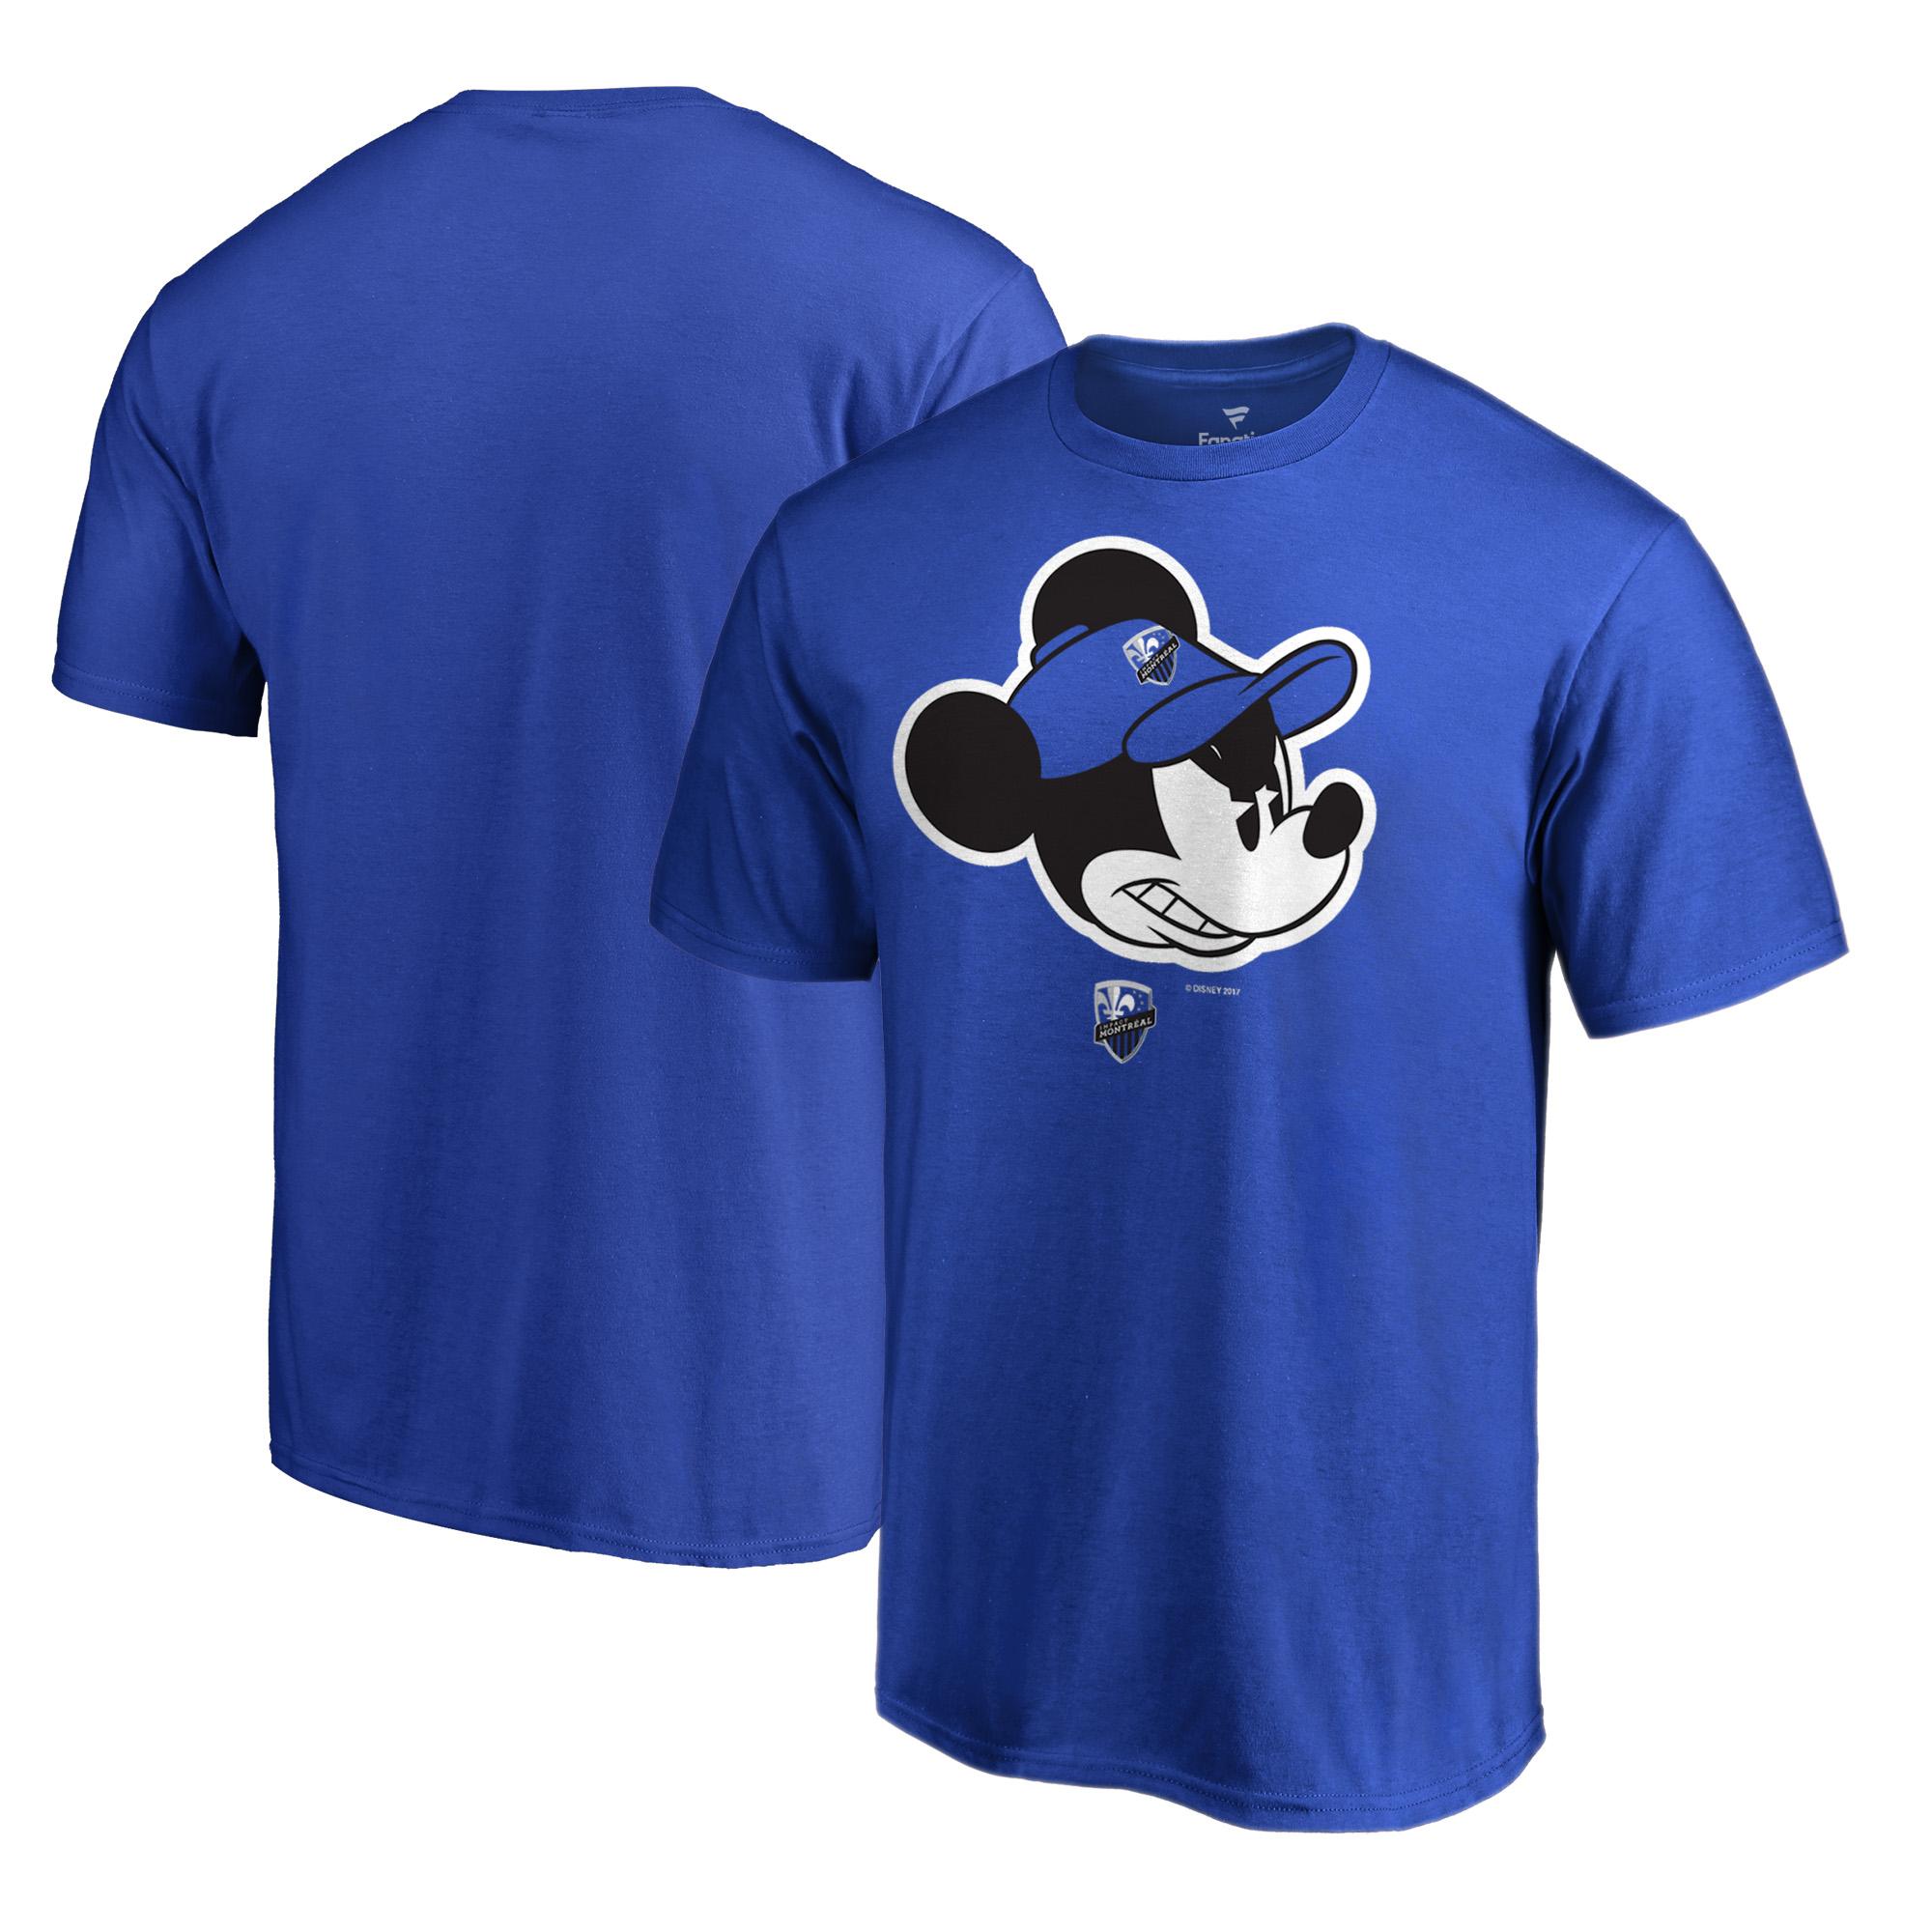 Montreal Impact Fanatics Branded Disney Game Face T-Shirt - Blue